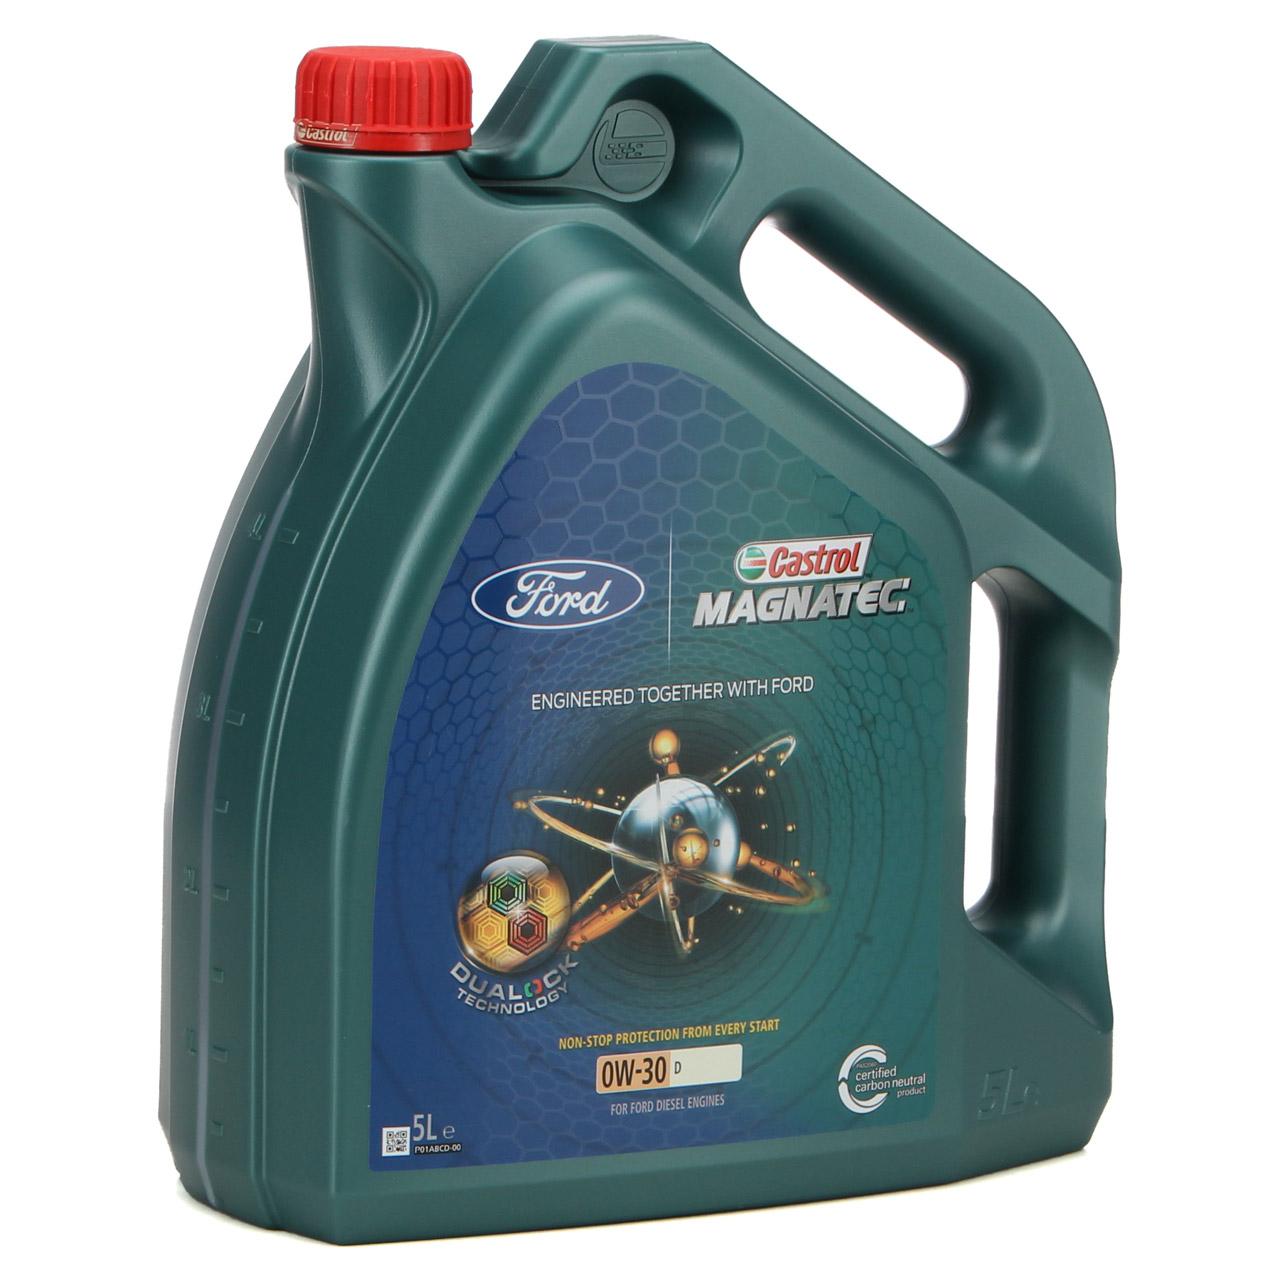 ORIGINAL Ford CASTROL Motoröl Öl MAGNATEC D 0W30 0W-30 5L 5 Liter 15D5FF